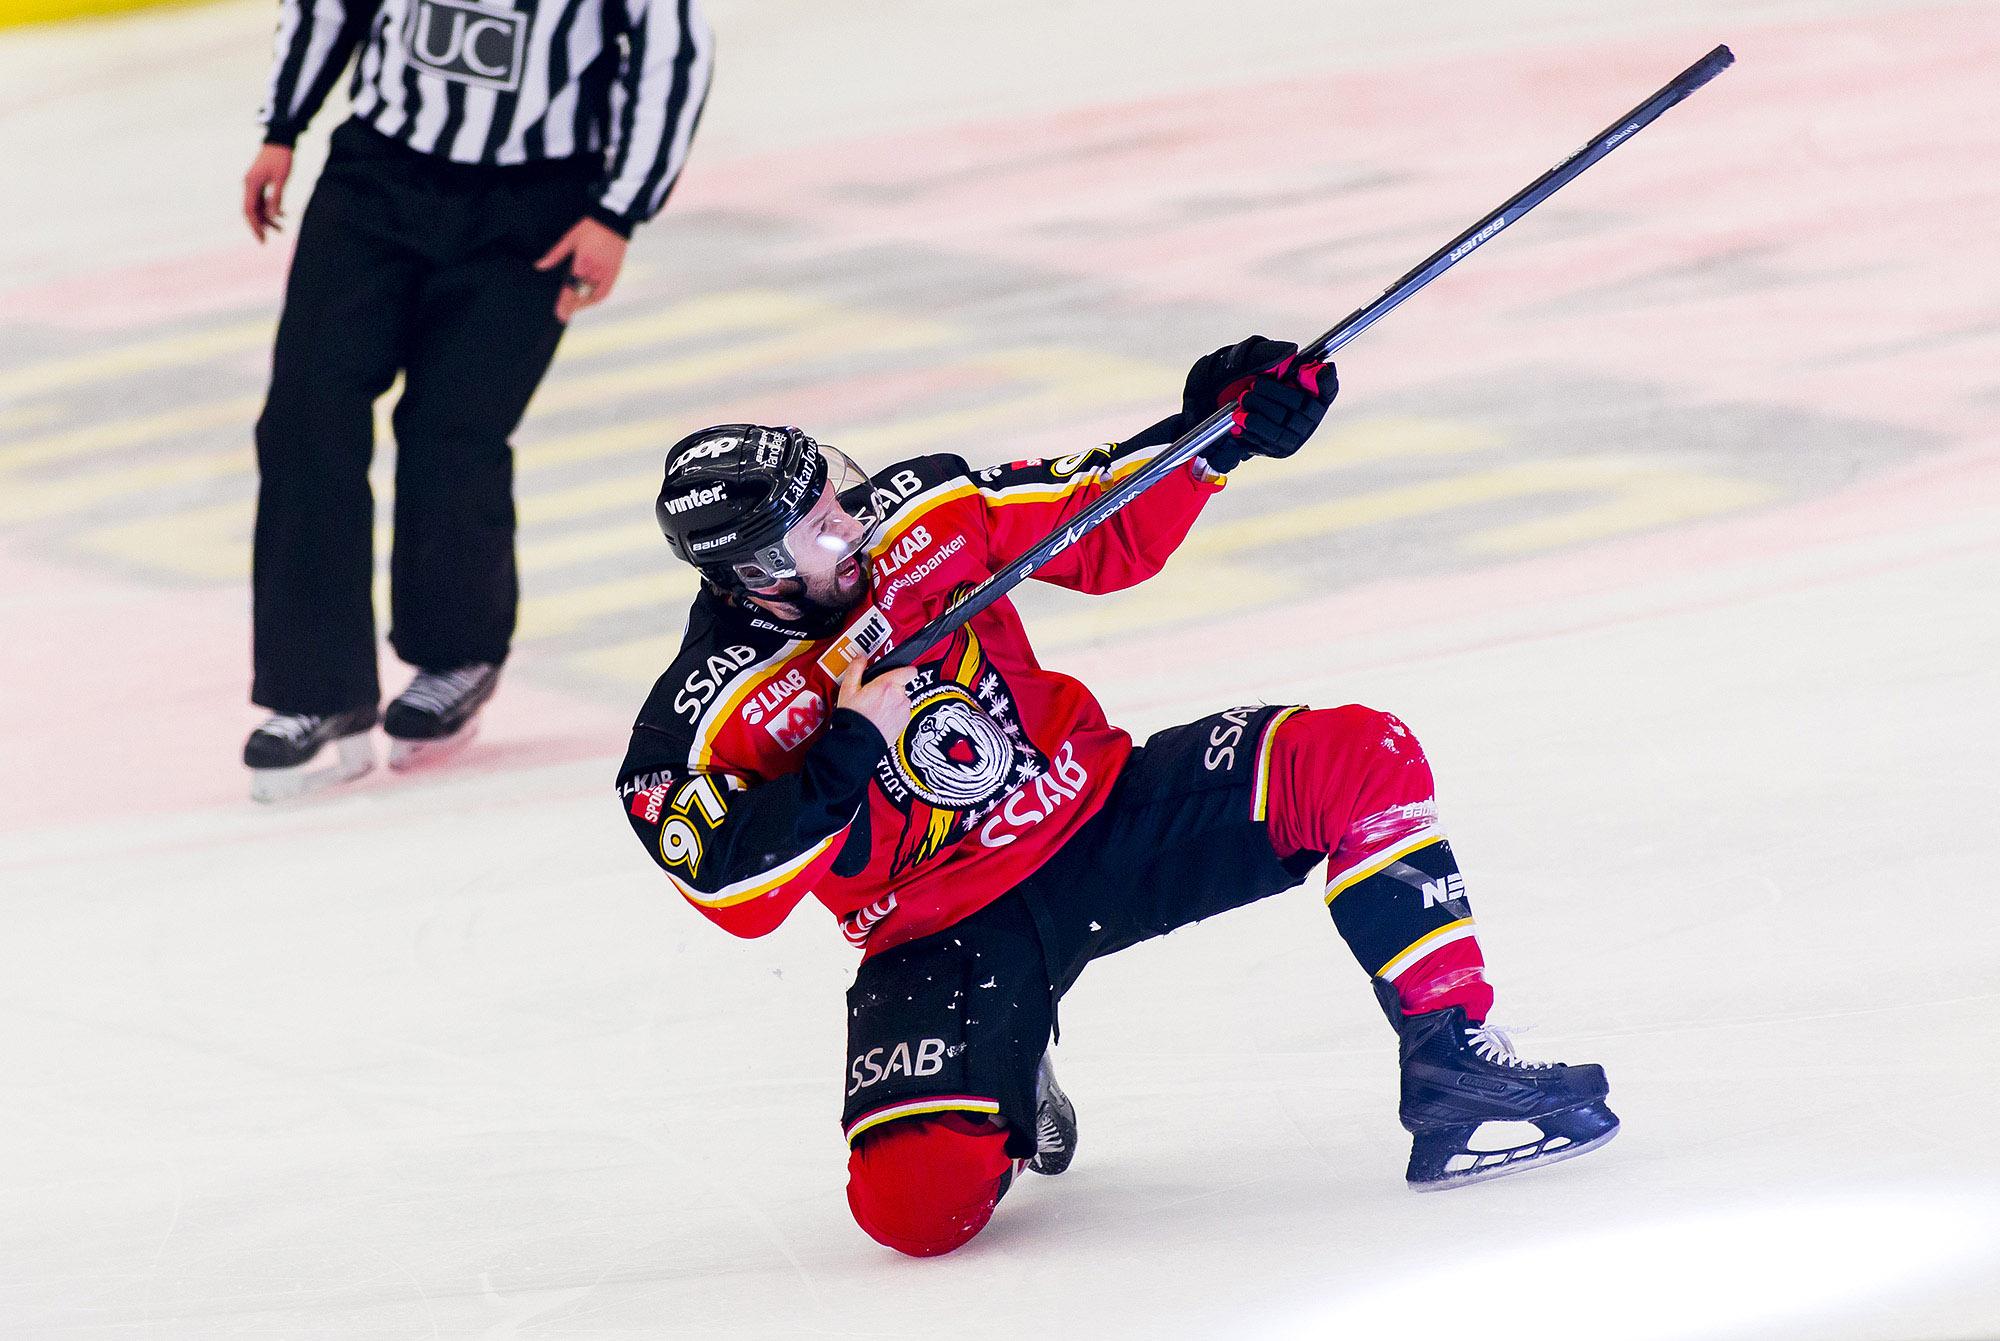 Sportfotograf i Luleå - Robert Nyholm